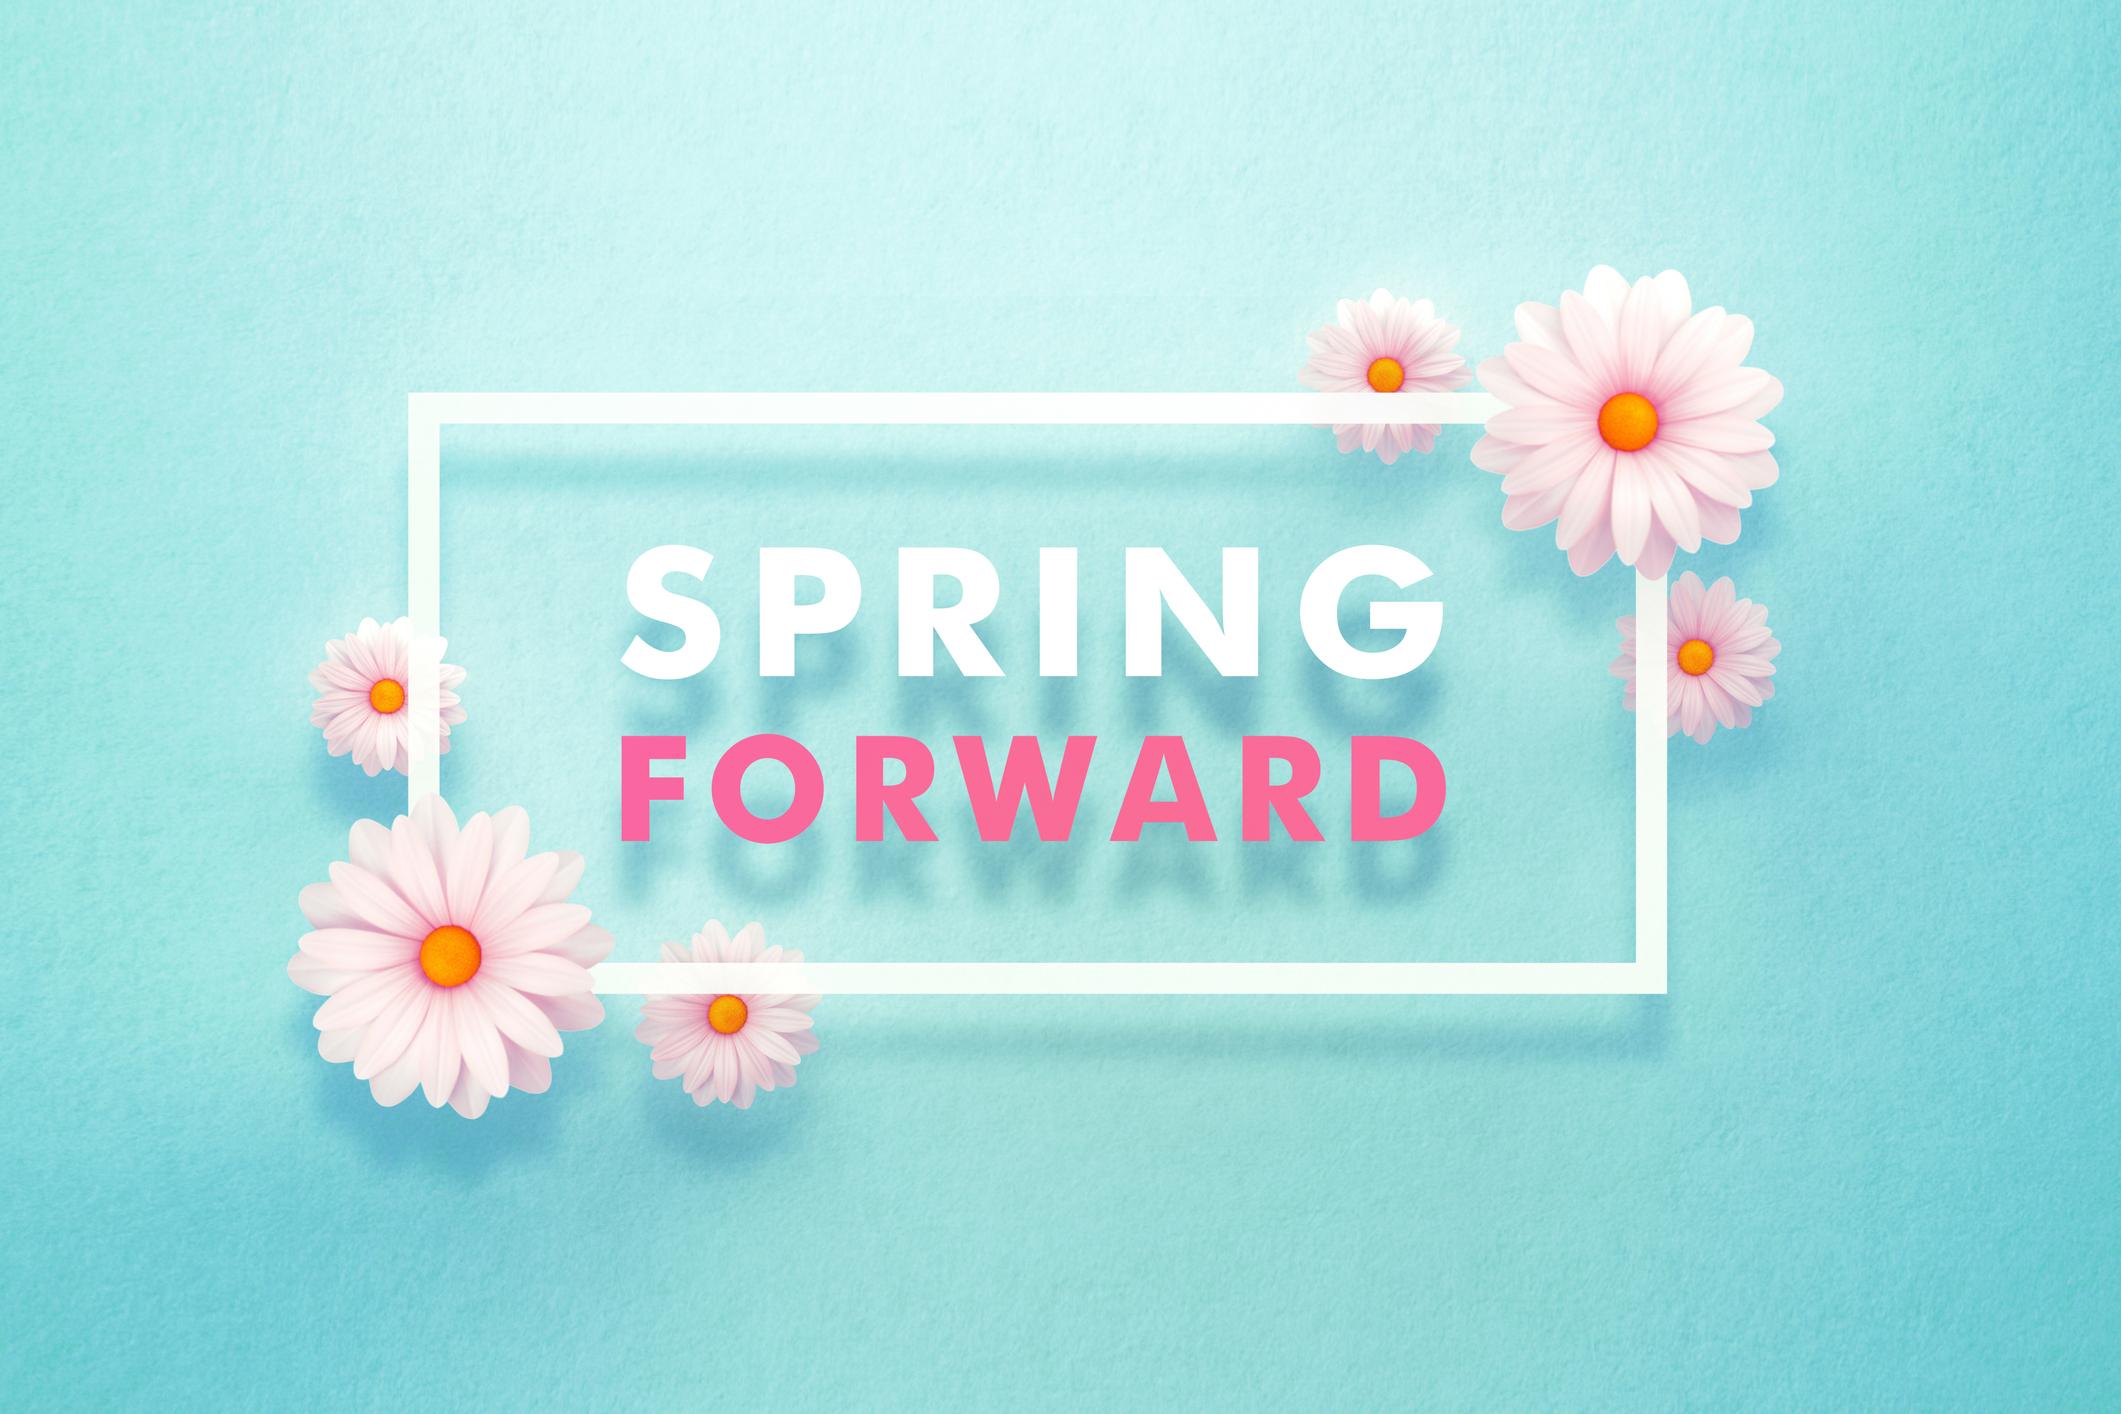 spring forward sign